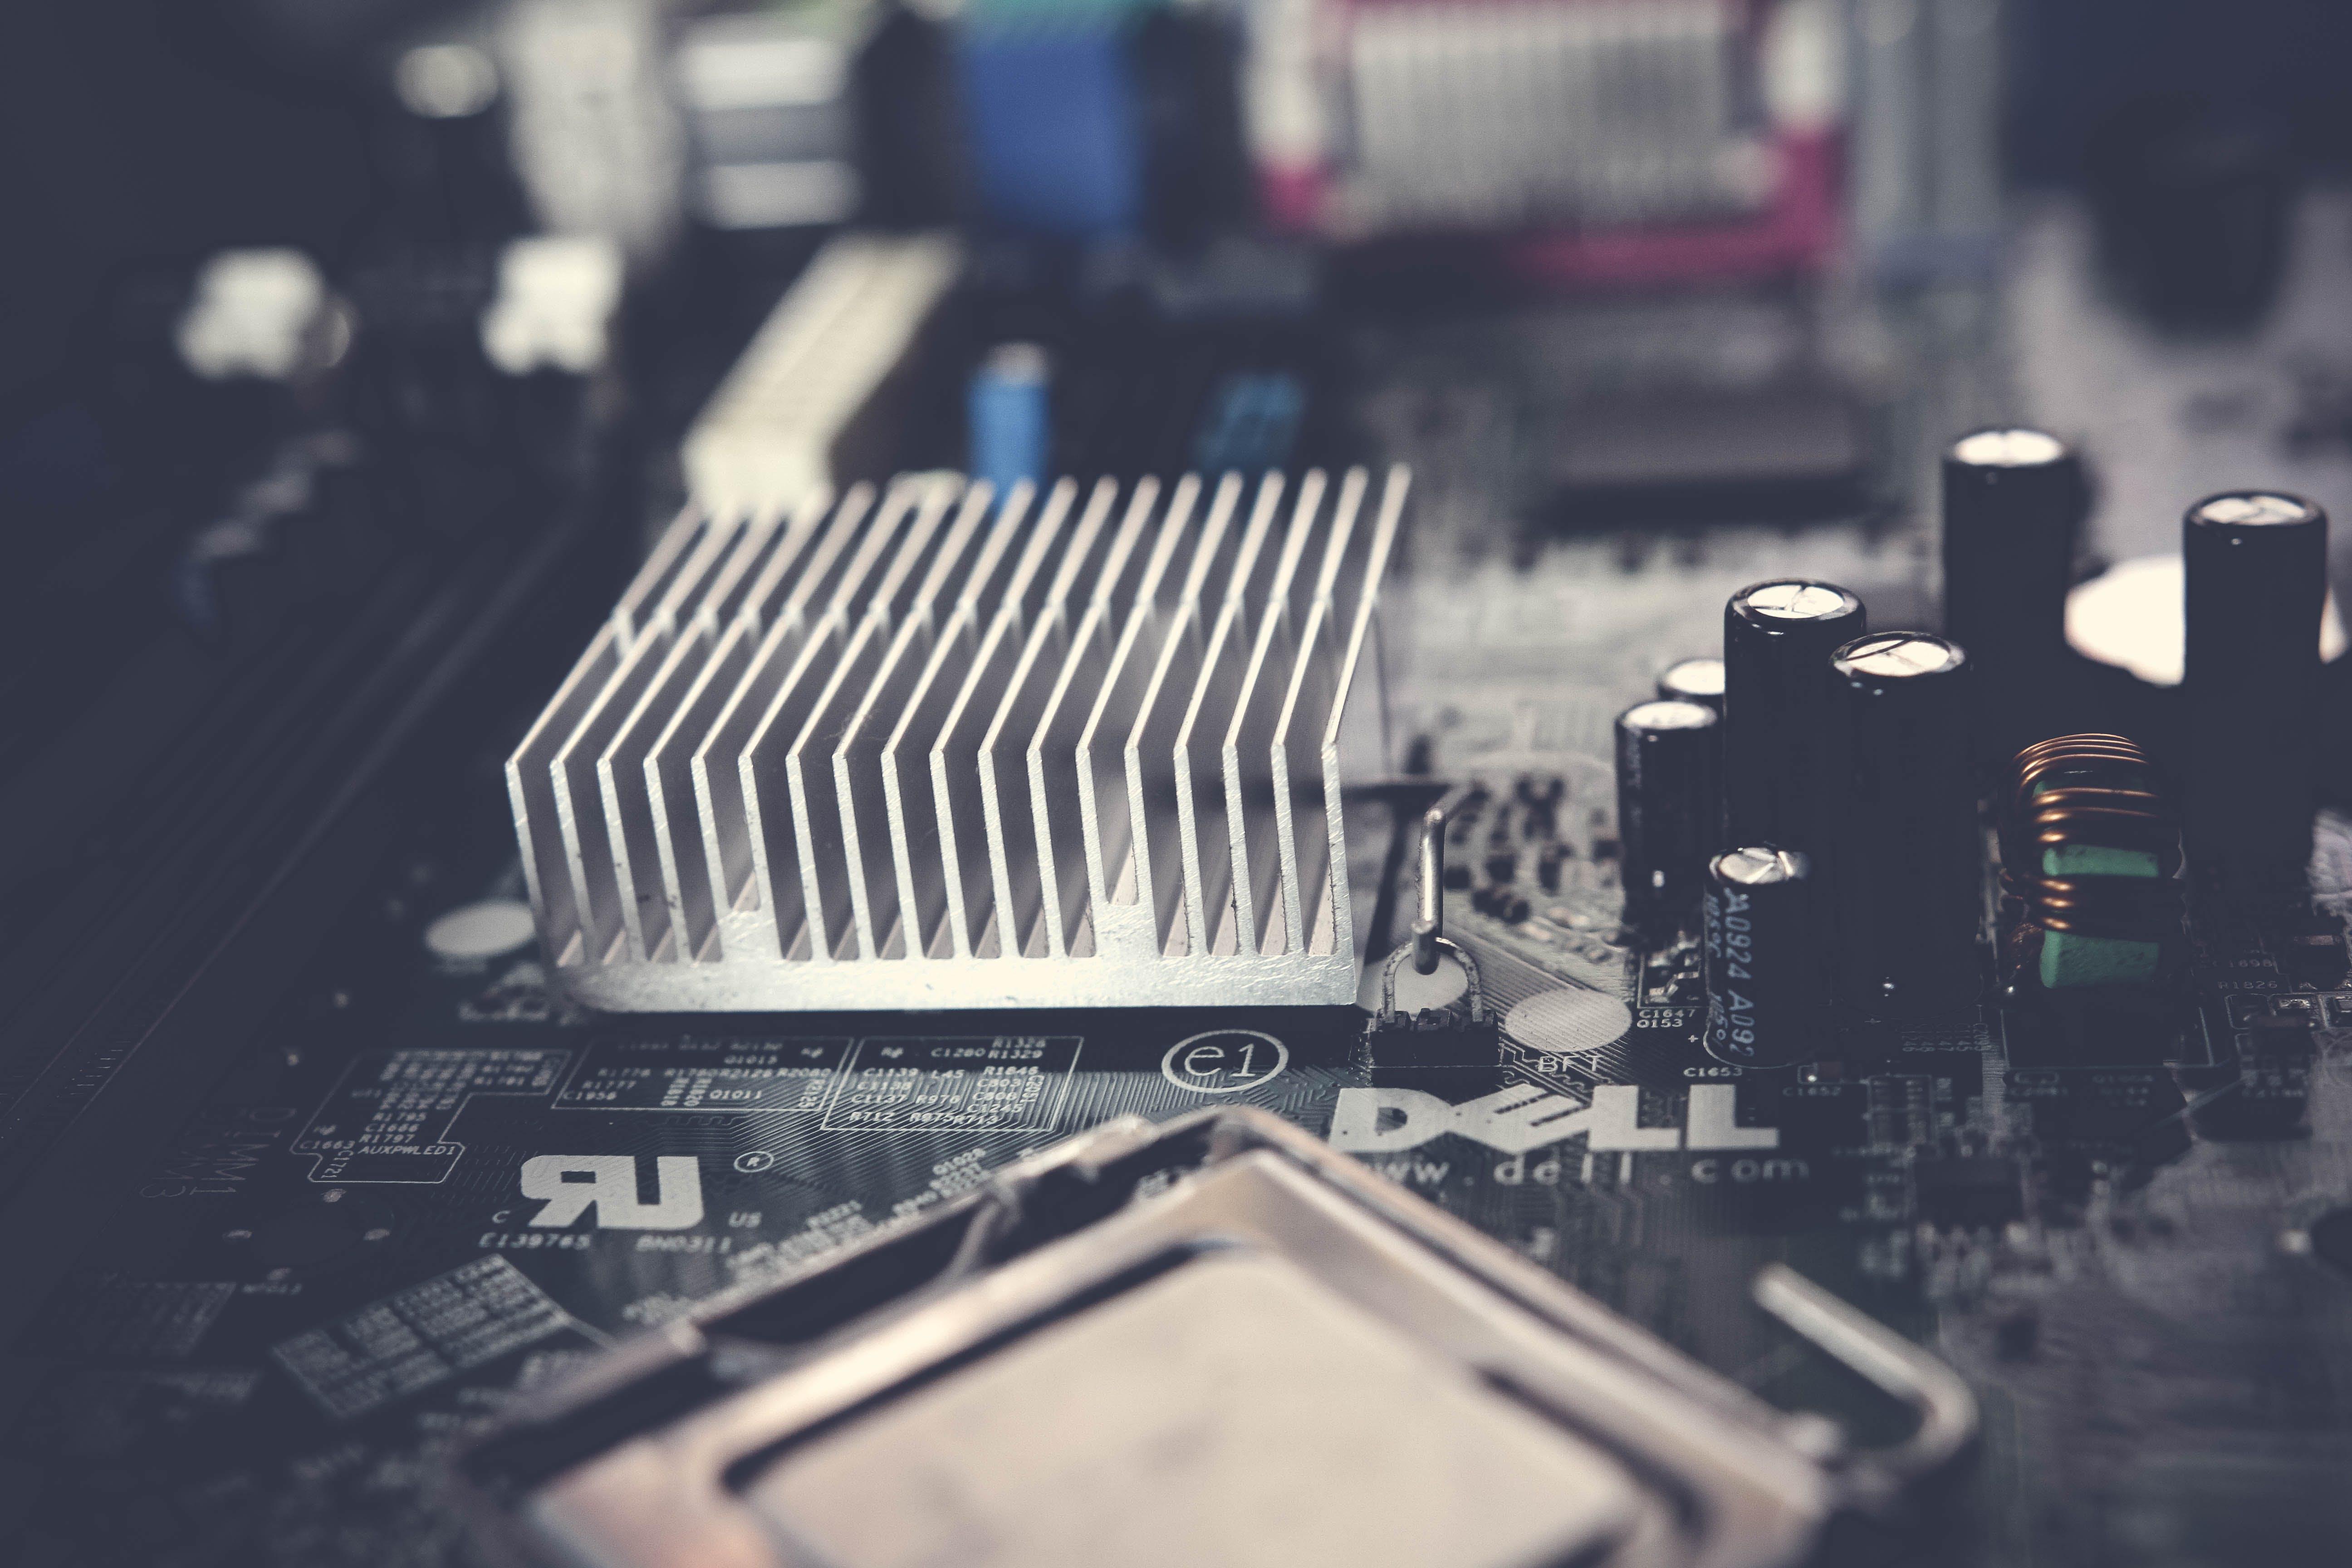 Selective Focus Photography of Heatsink